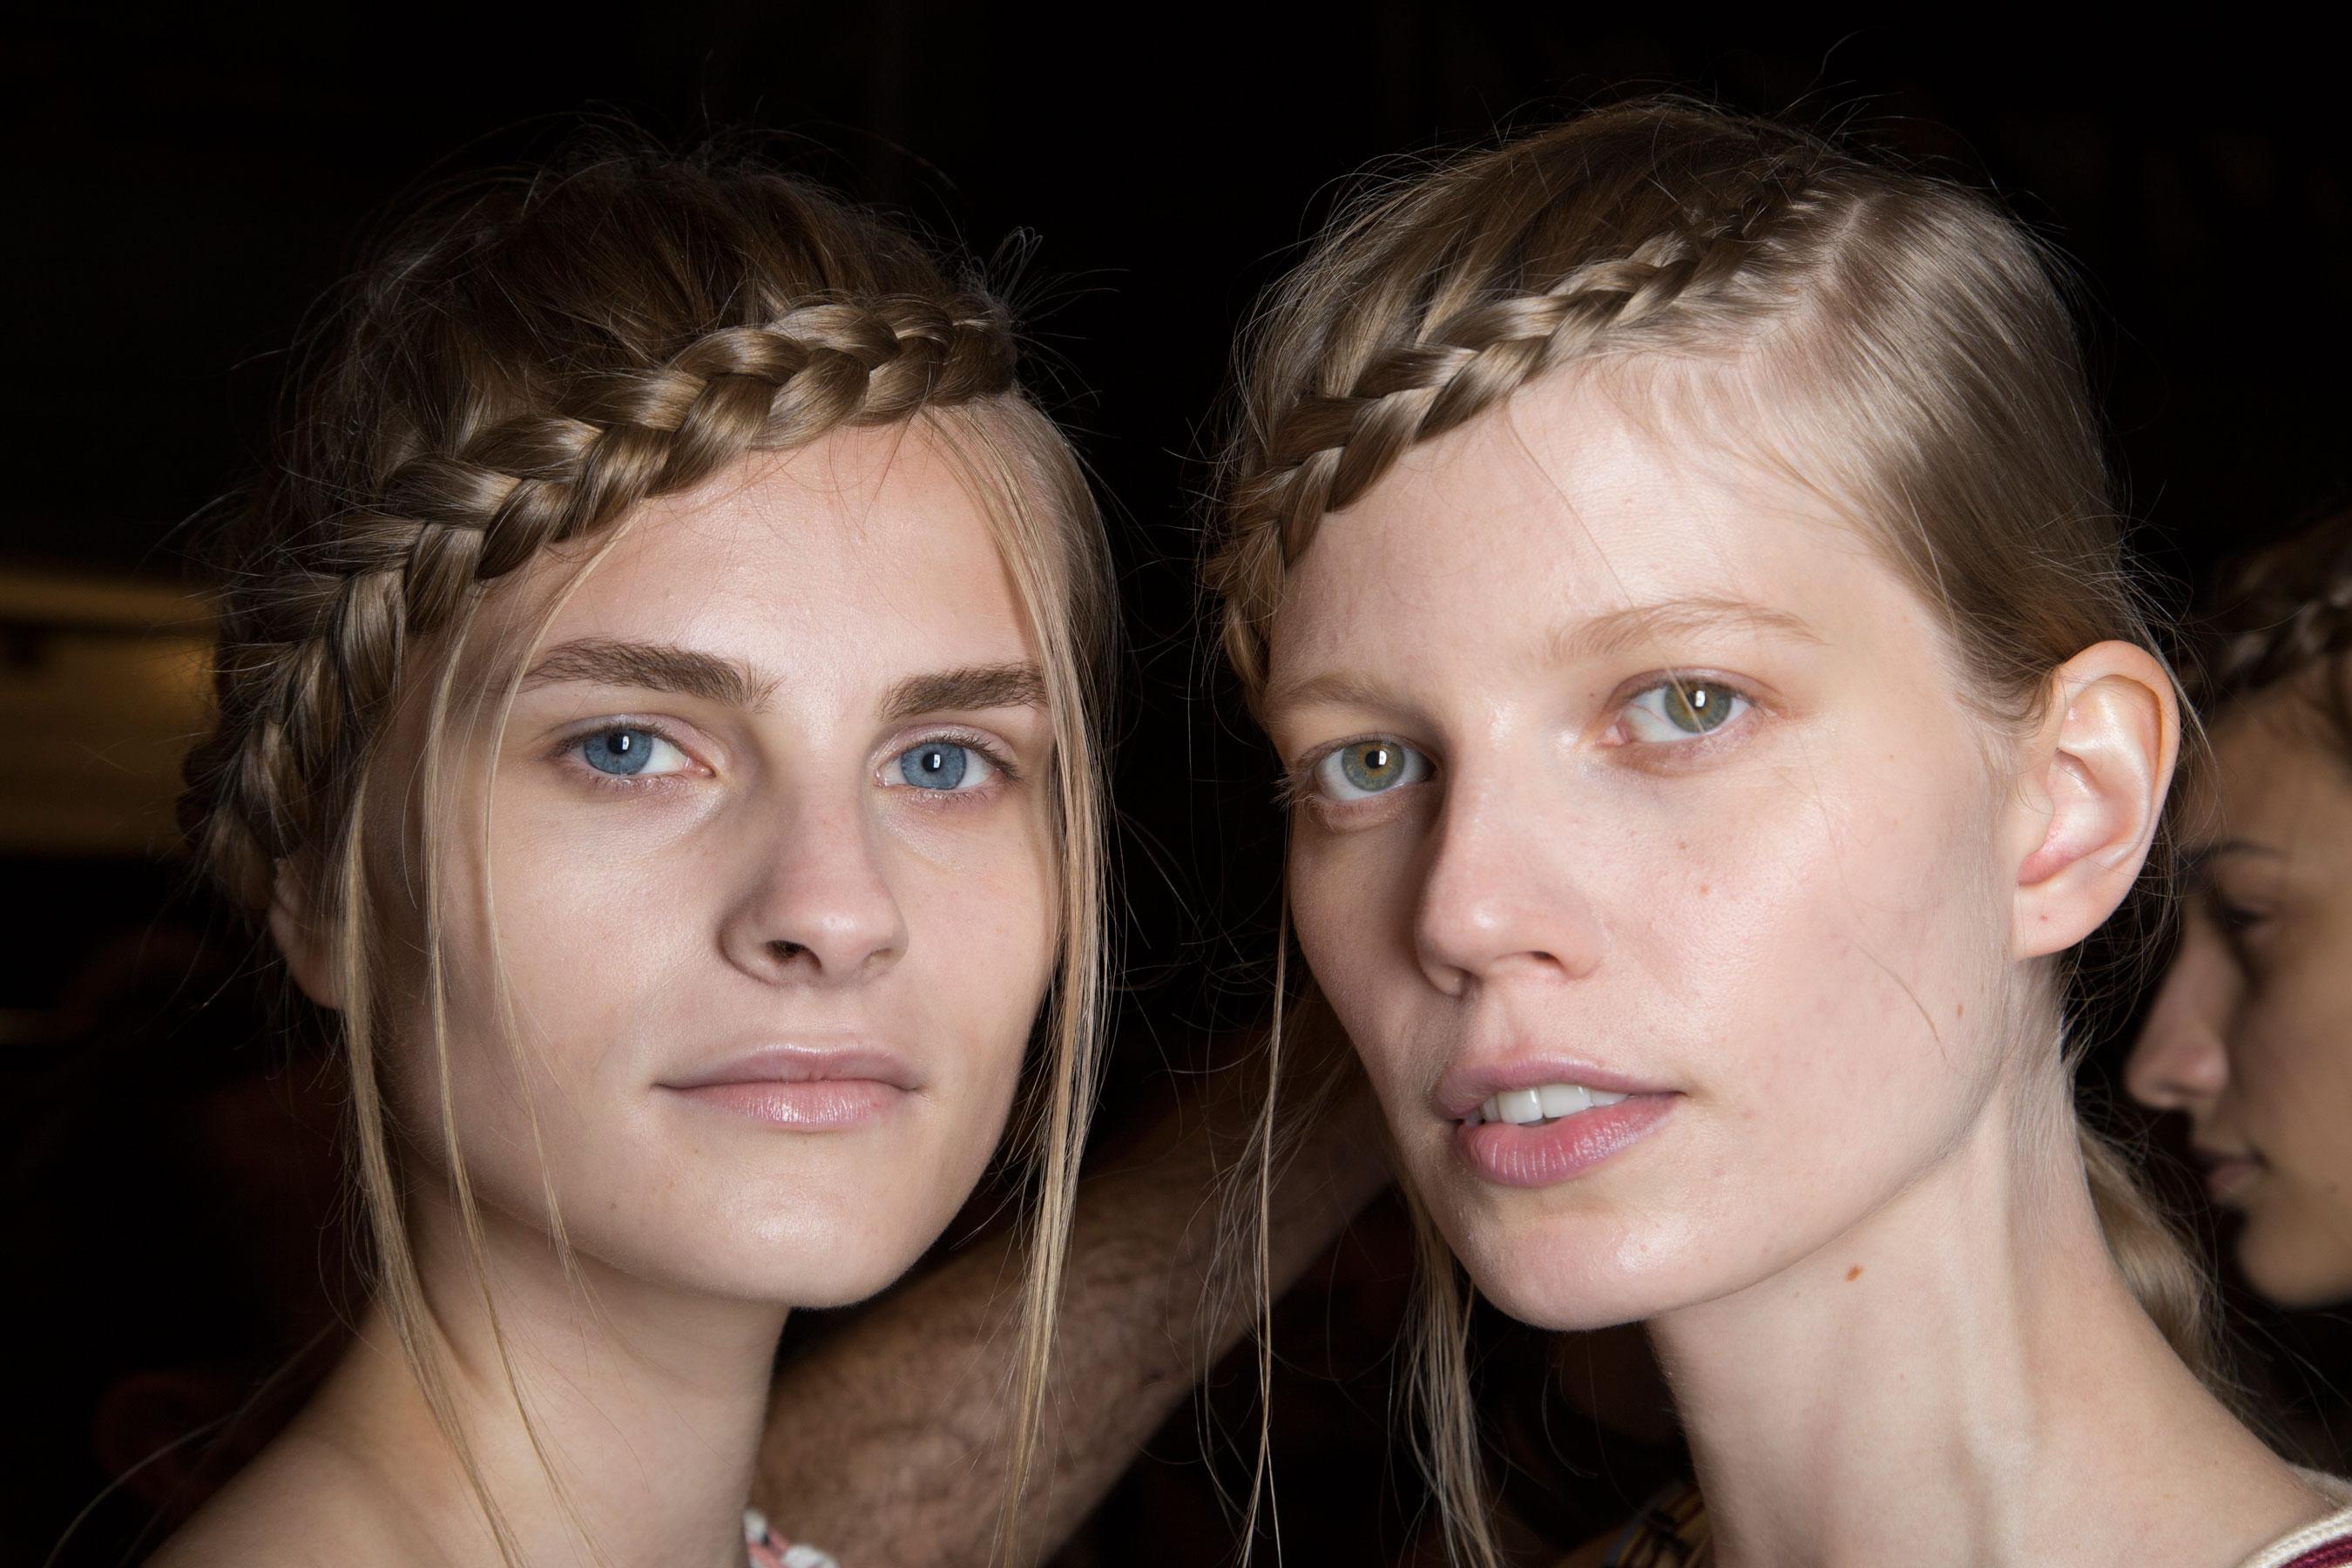 Herve-Leger-backstage-beauty-spring-2016-fashion-show-the-impression-86